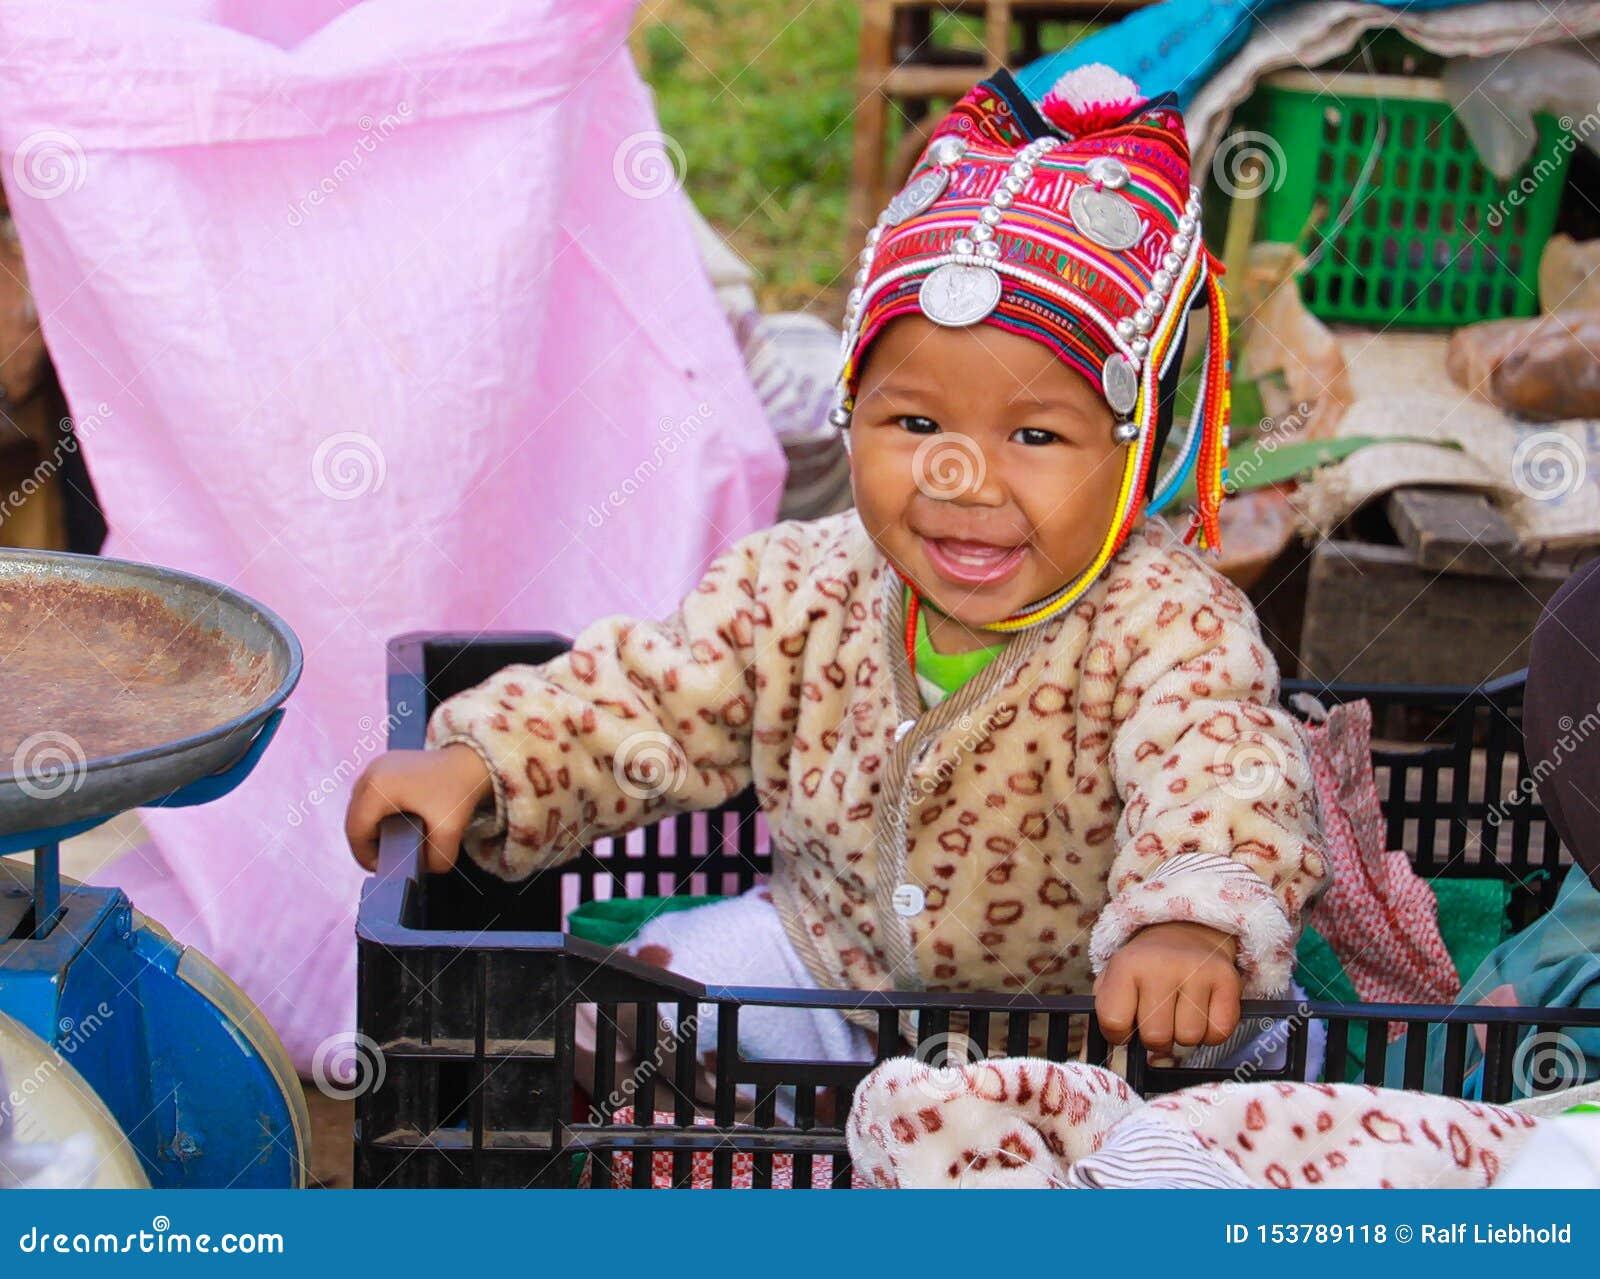 MAE SALONG, ΤΑΪΛΆΝΔΗ - 17 ΔΕΚΕΜΒΡΊΟΥ 2017: Πορτρέτο ενός ευτυχούς μωρού μικρών παιδιών από τη φυλή λόφων Akha σε ένα κιβώτιο αγορ